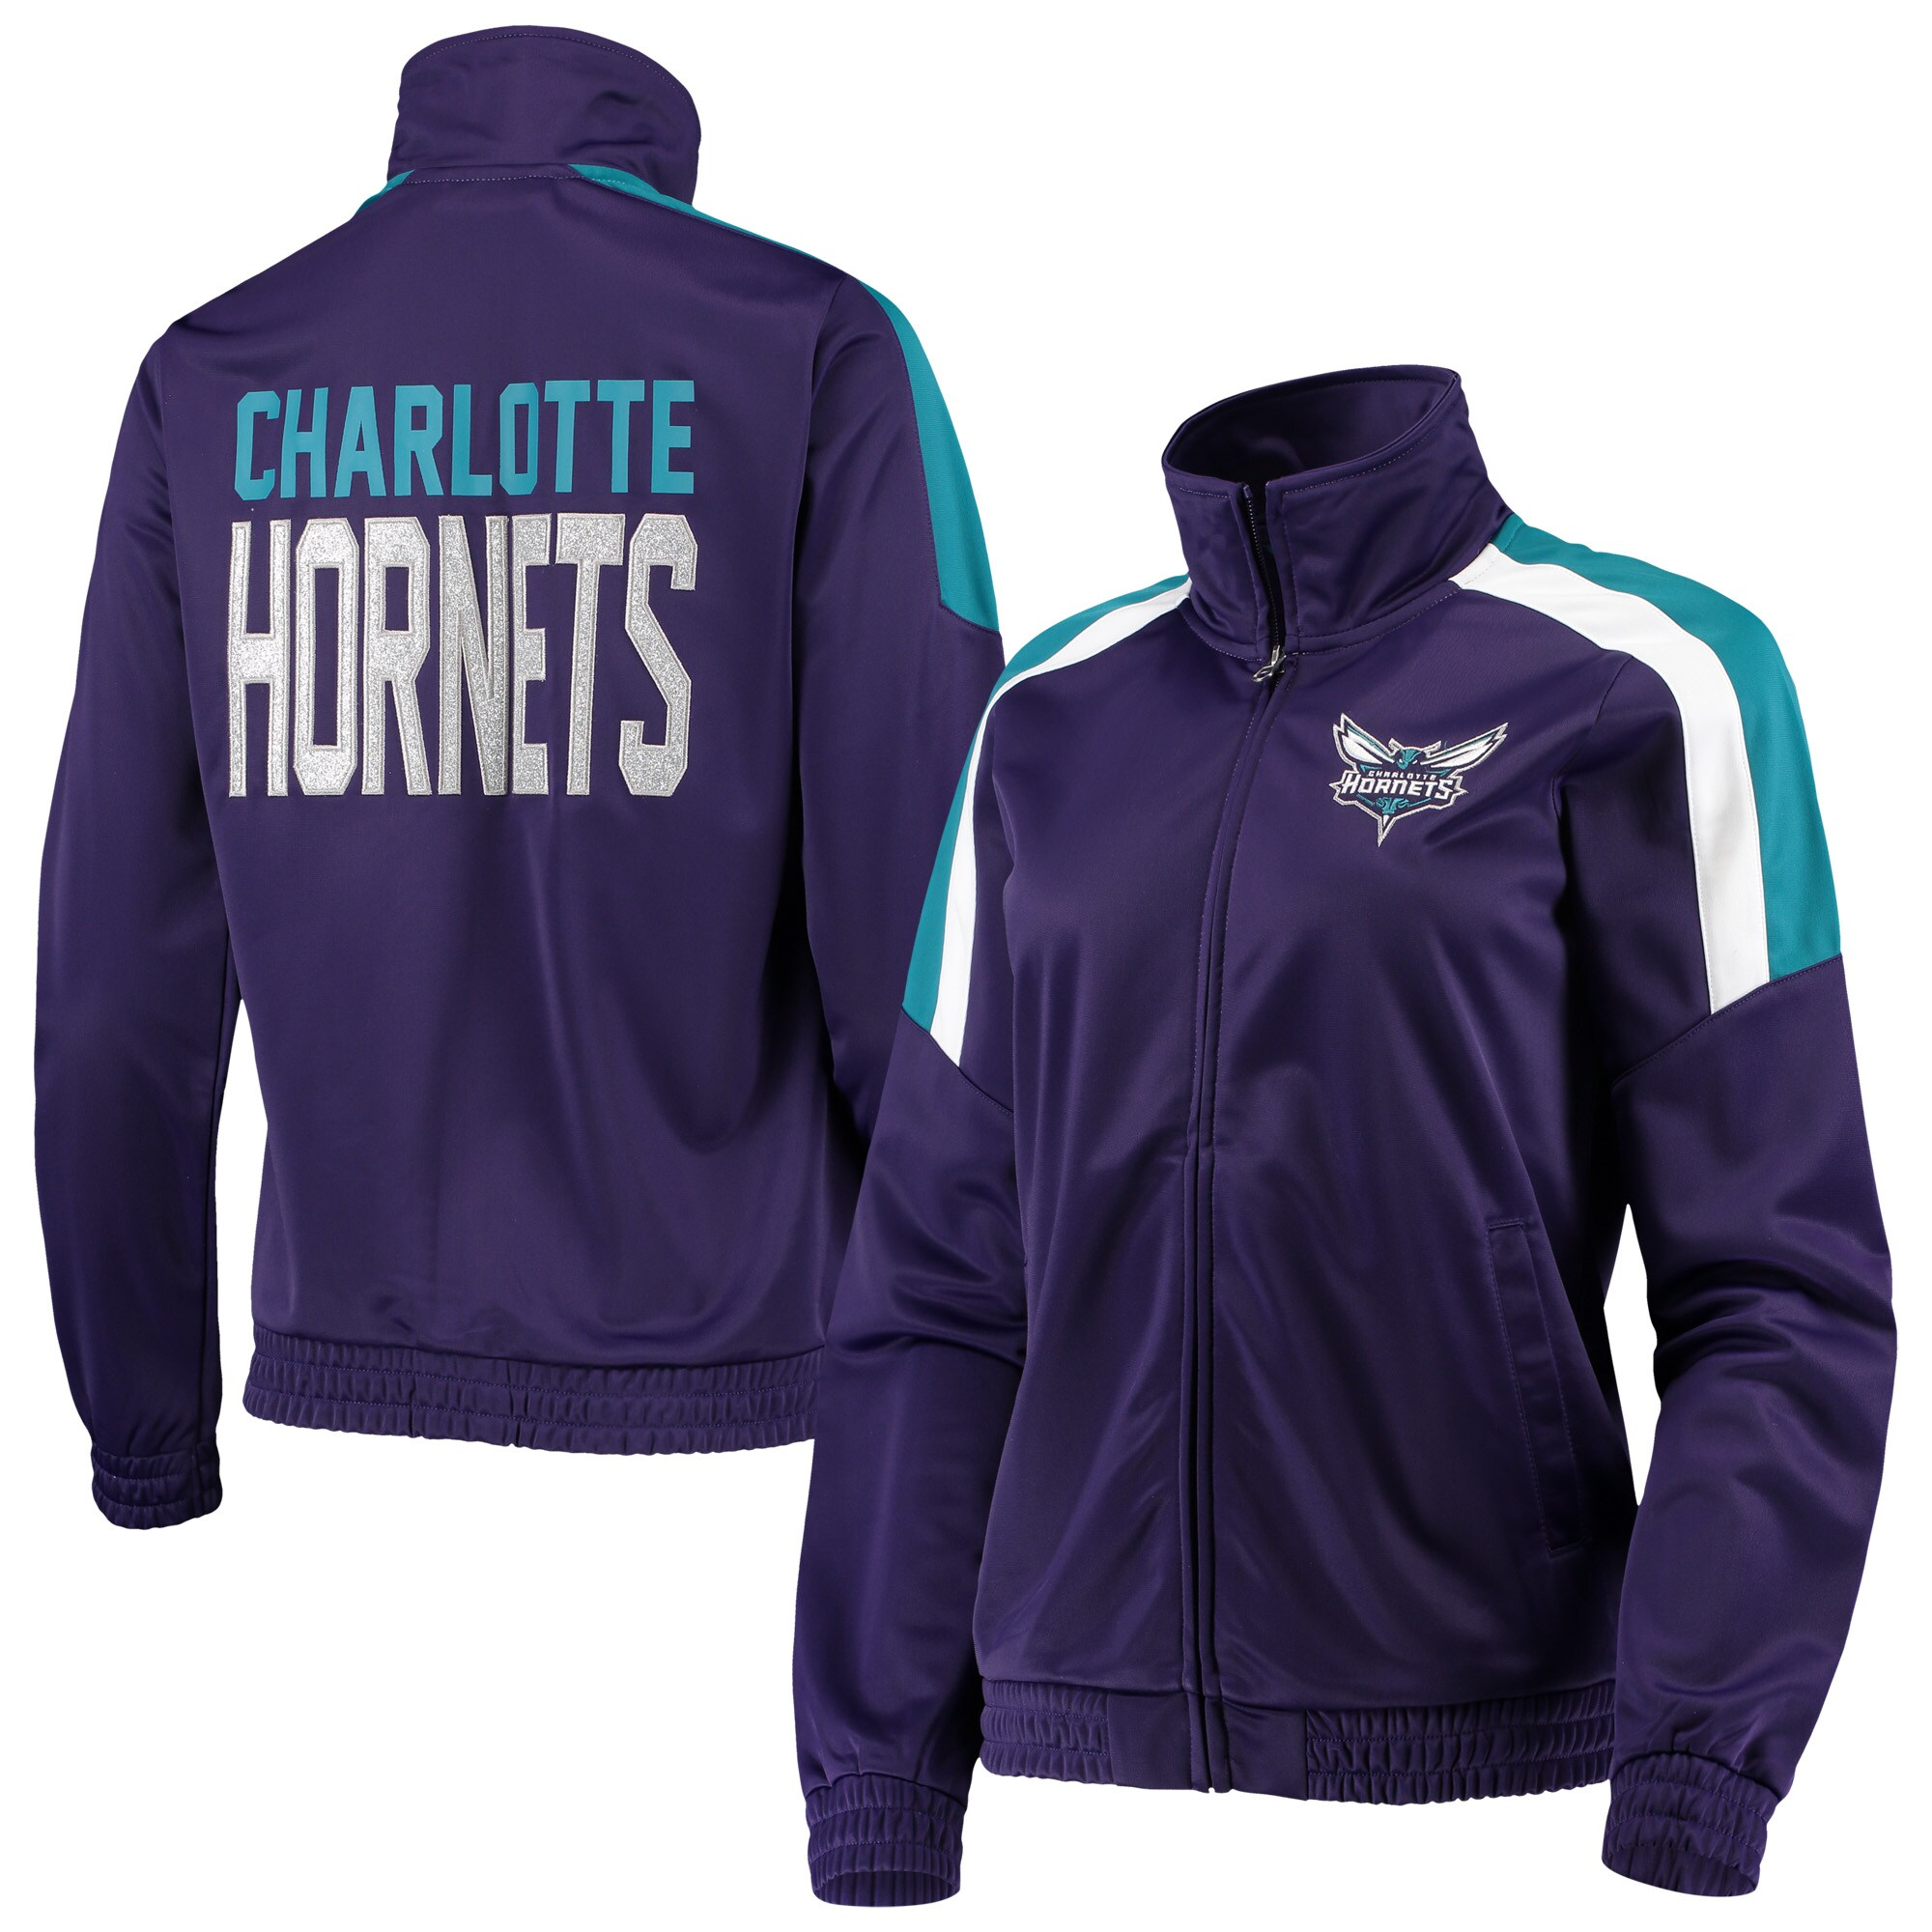 Charlotte Hornets G-III 4Her by Carl Banks Women's Jump Shot Full-Zip Track Jacket - Purple